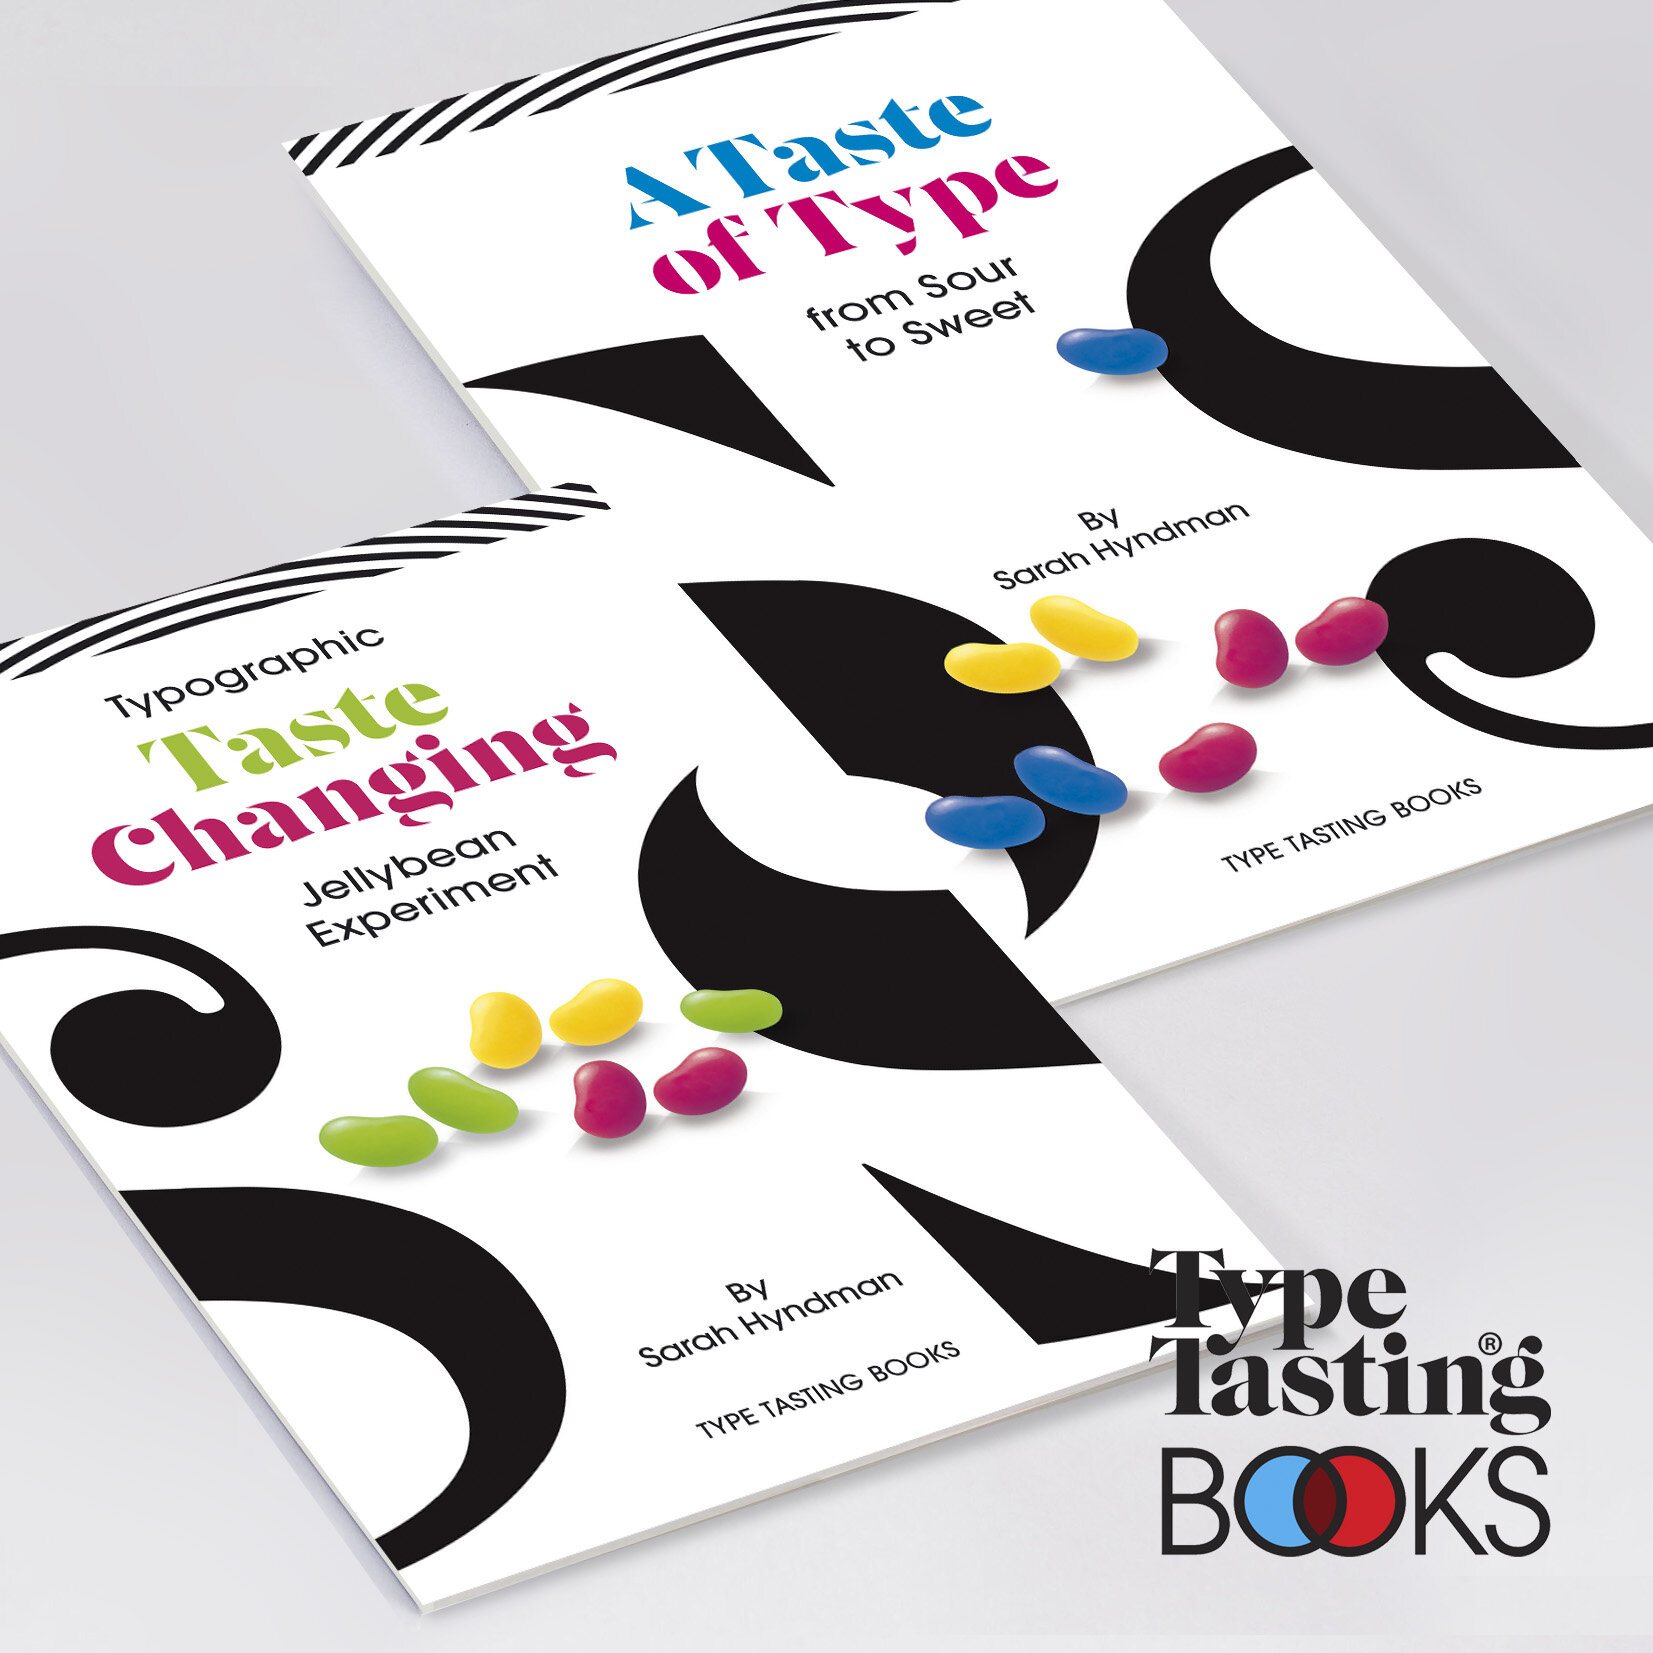 New Type Tasting Books series